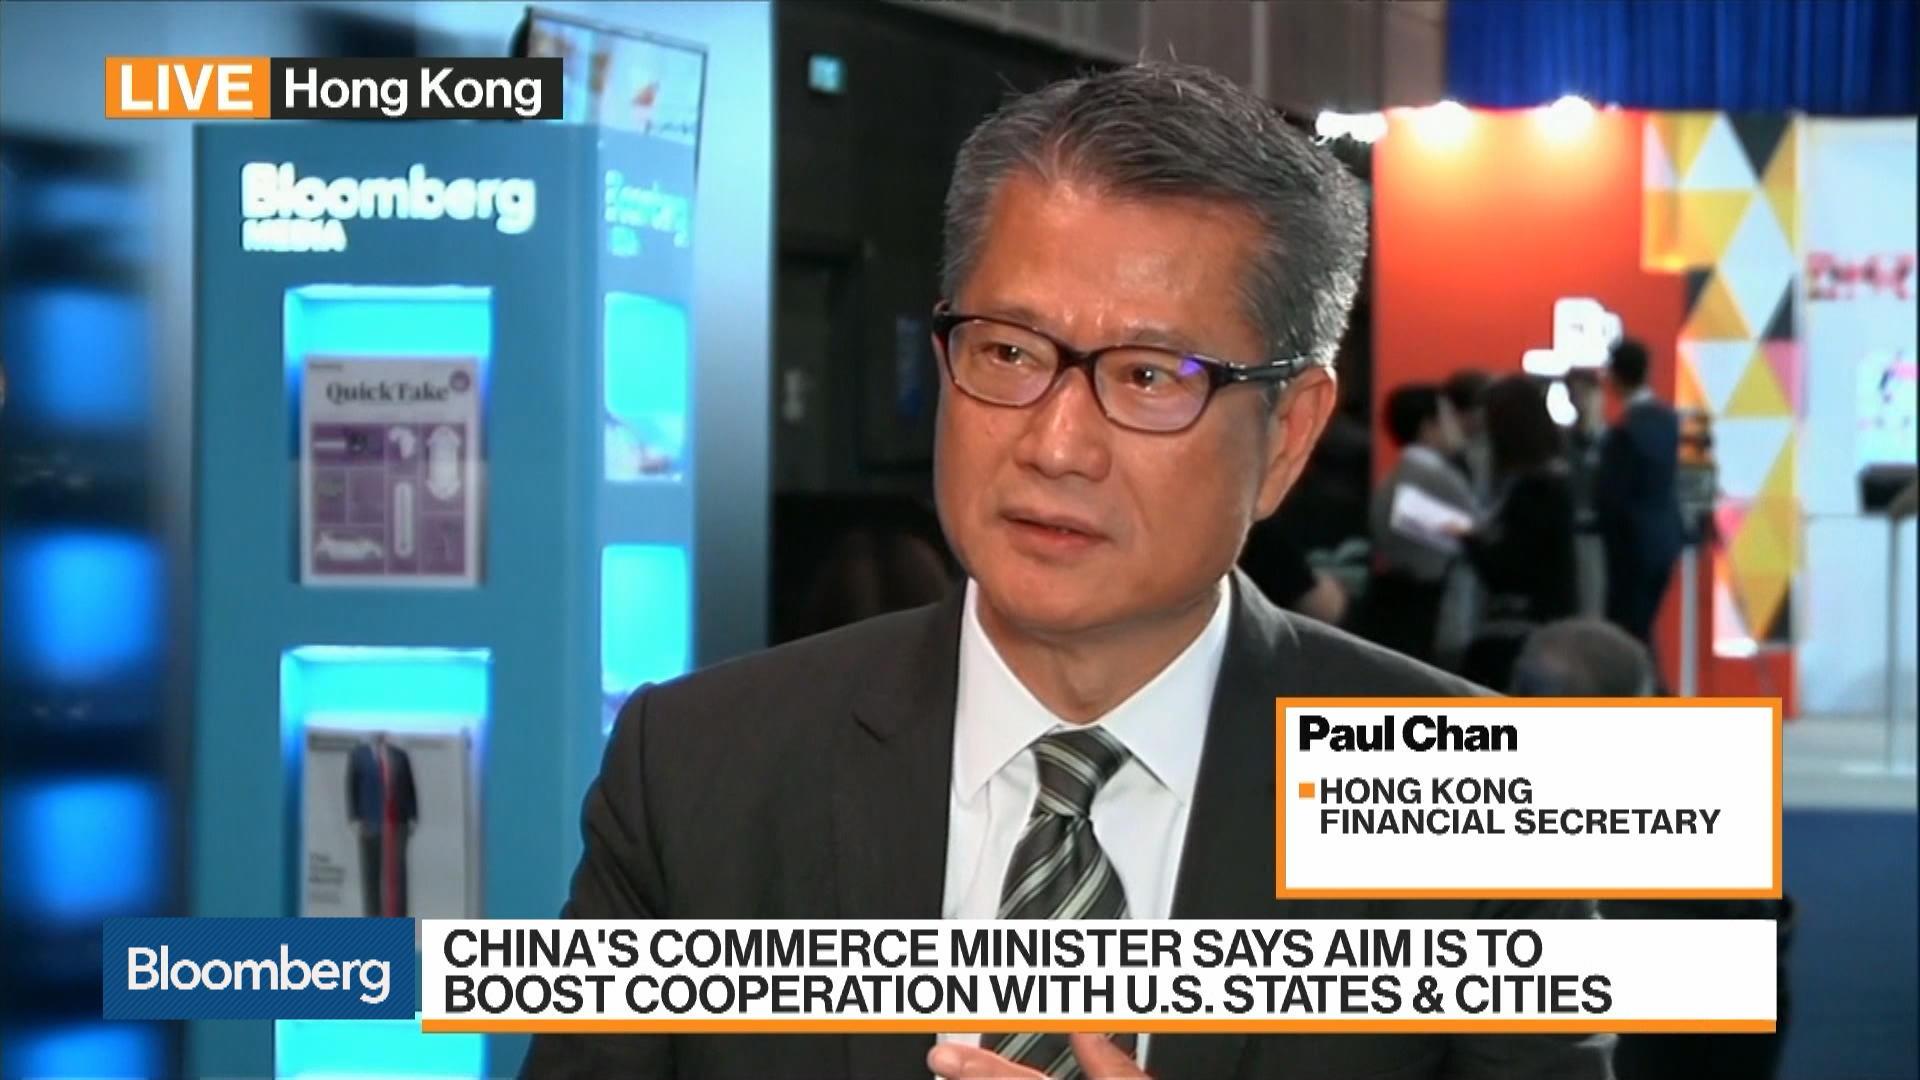 Hong Kong Financial Secretary On Economy U S China Trade Property Market Bloomberg